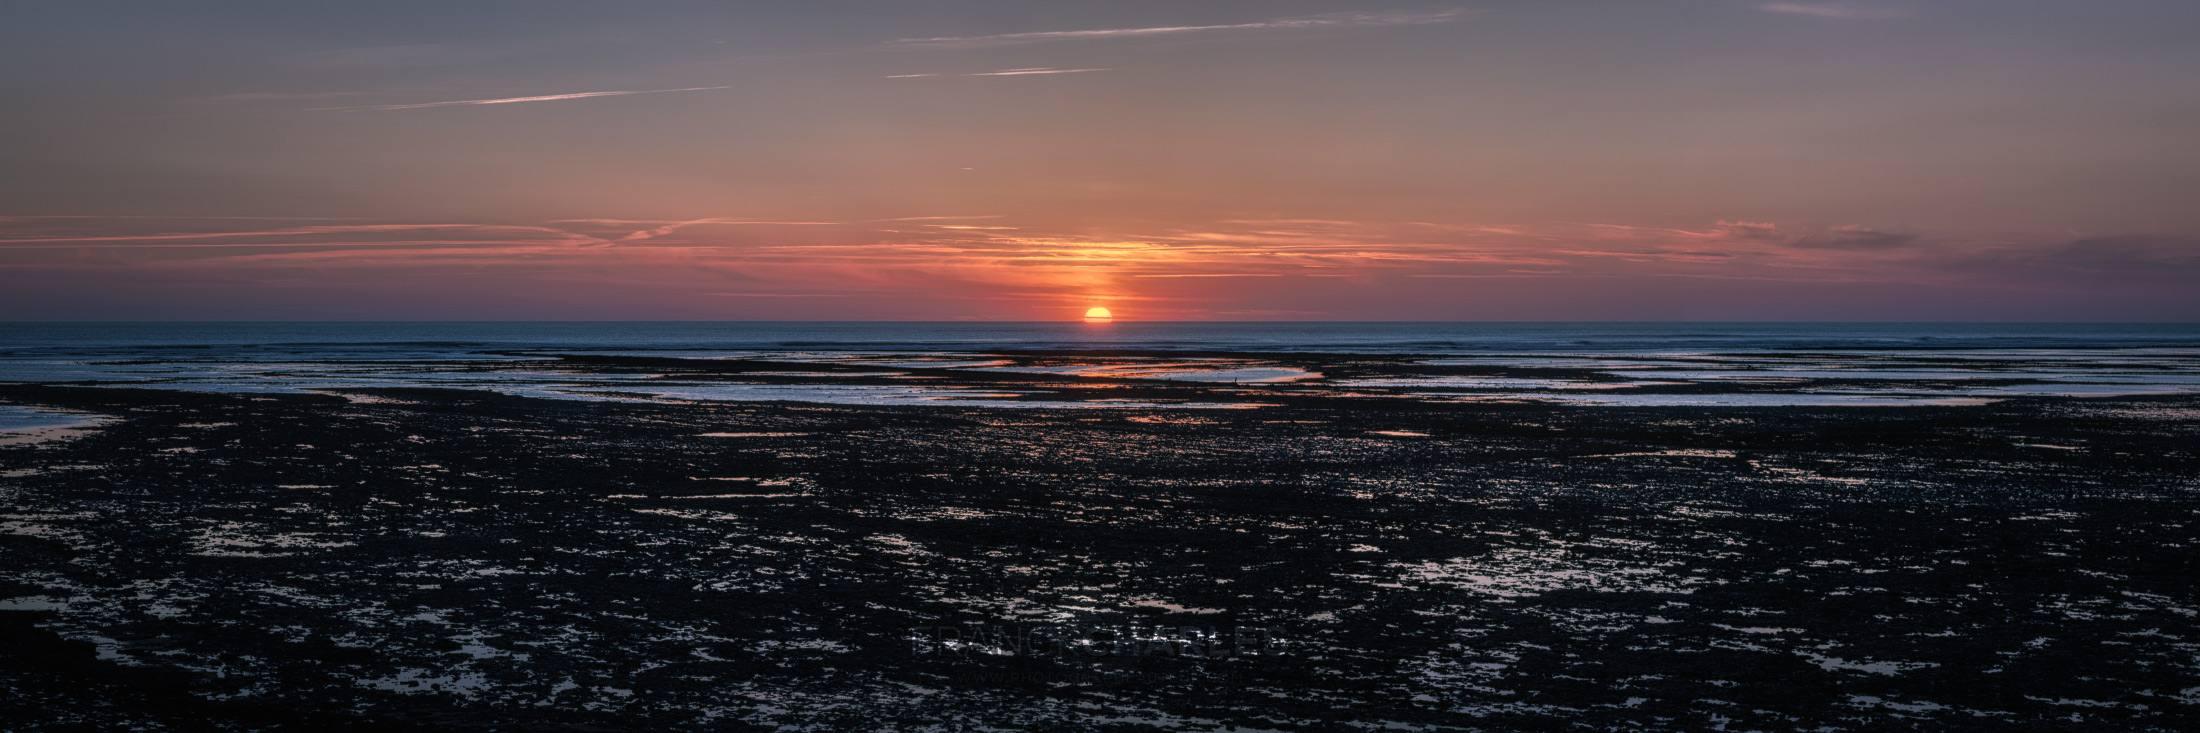 Oléron Sunset  - Franck Charles